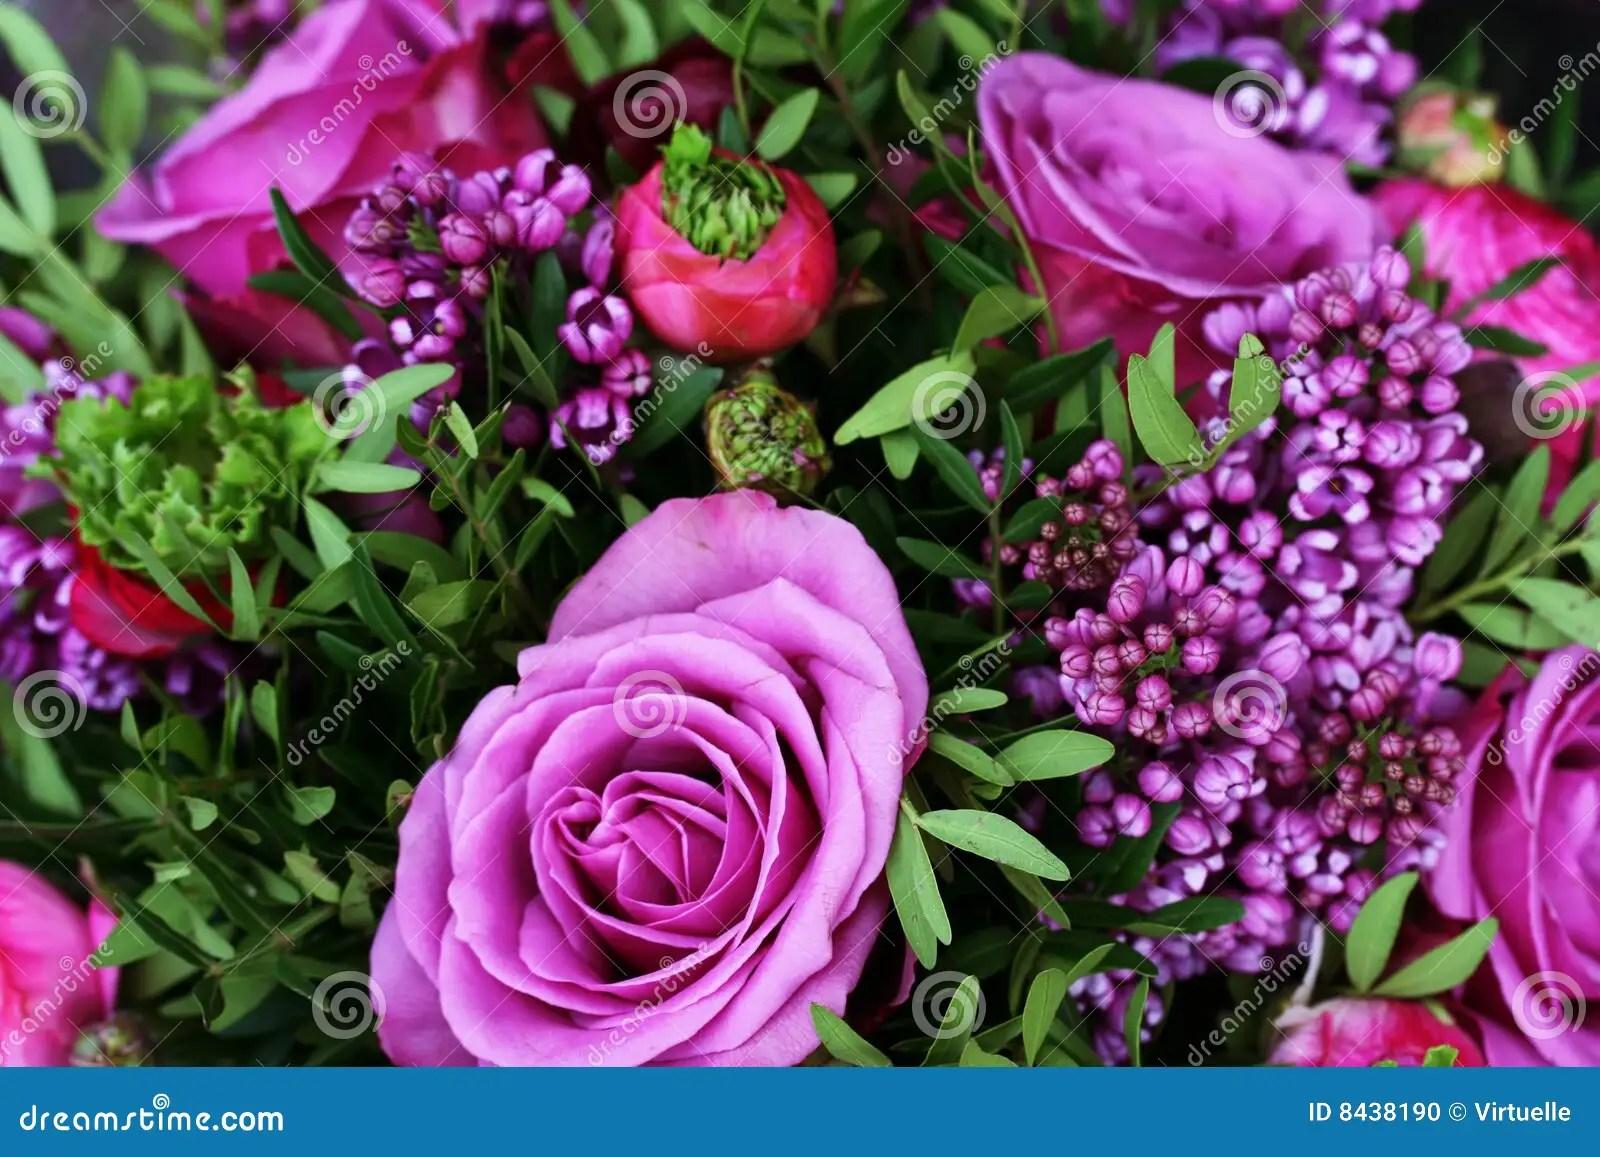 Romantic Bouquet With Purple Roses Stock Photo Image